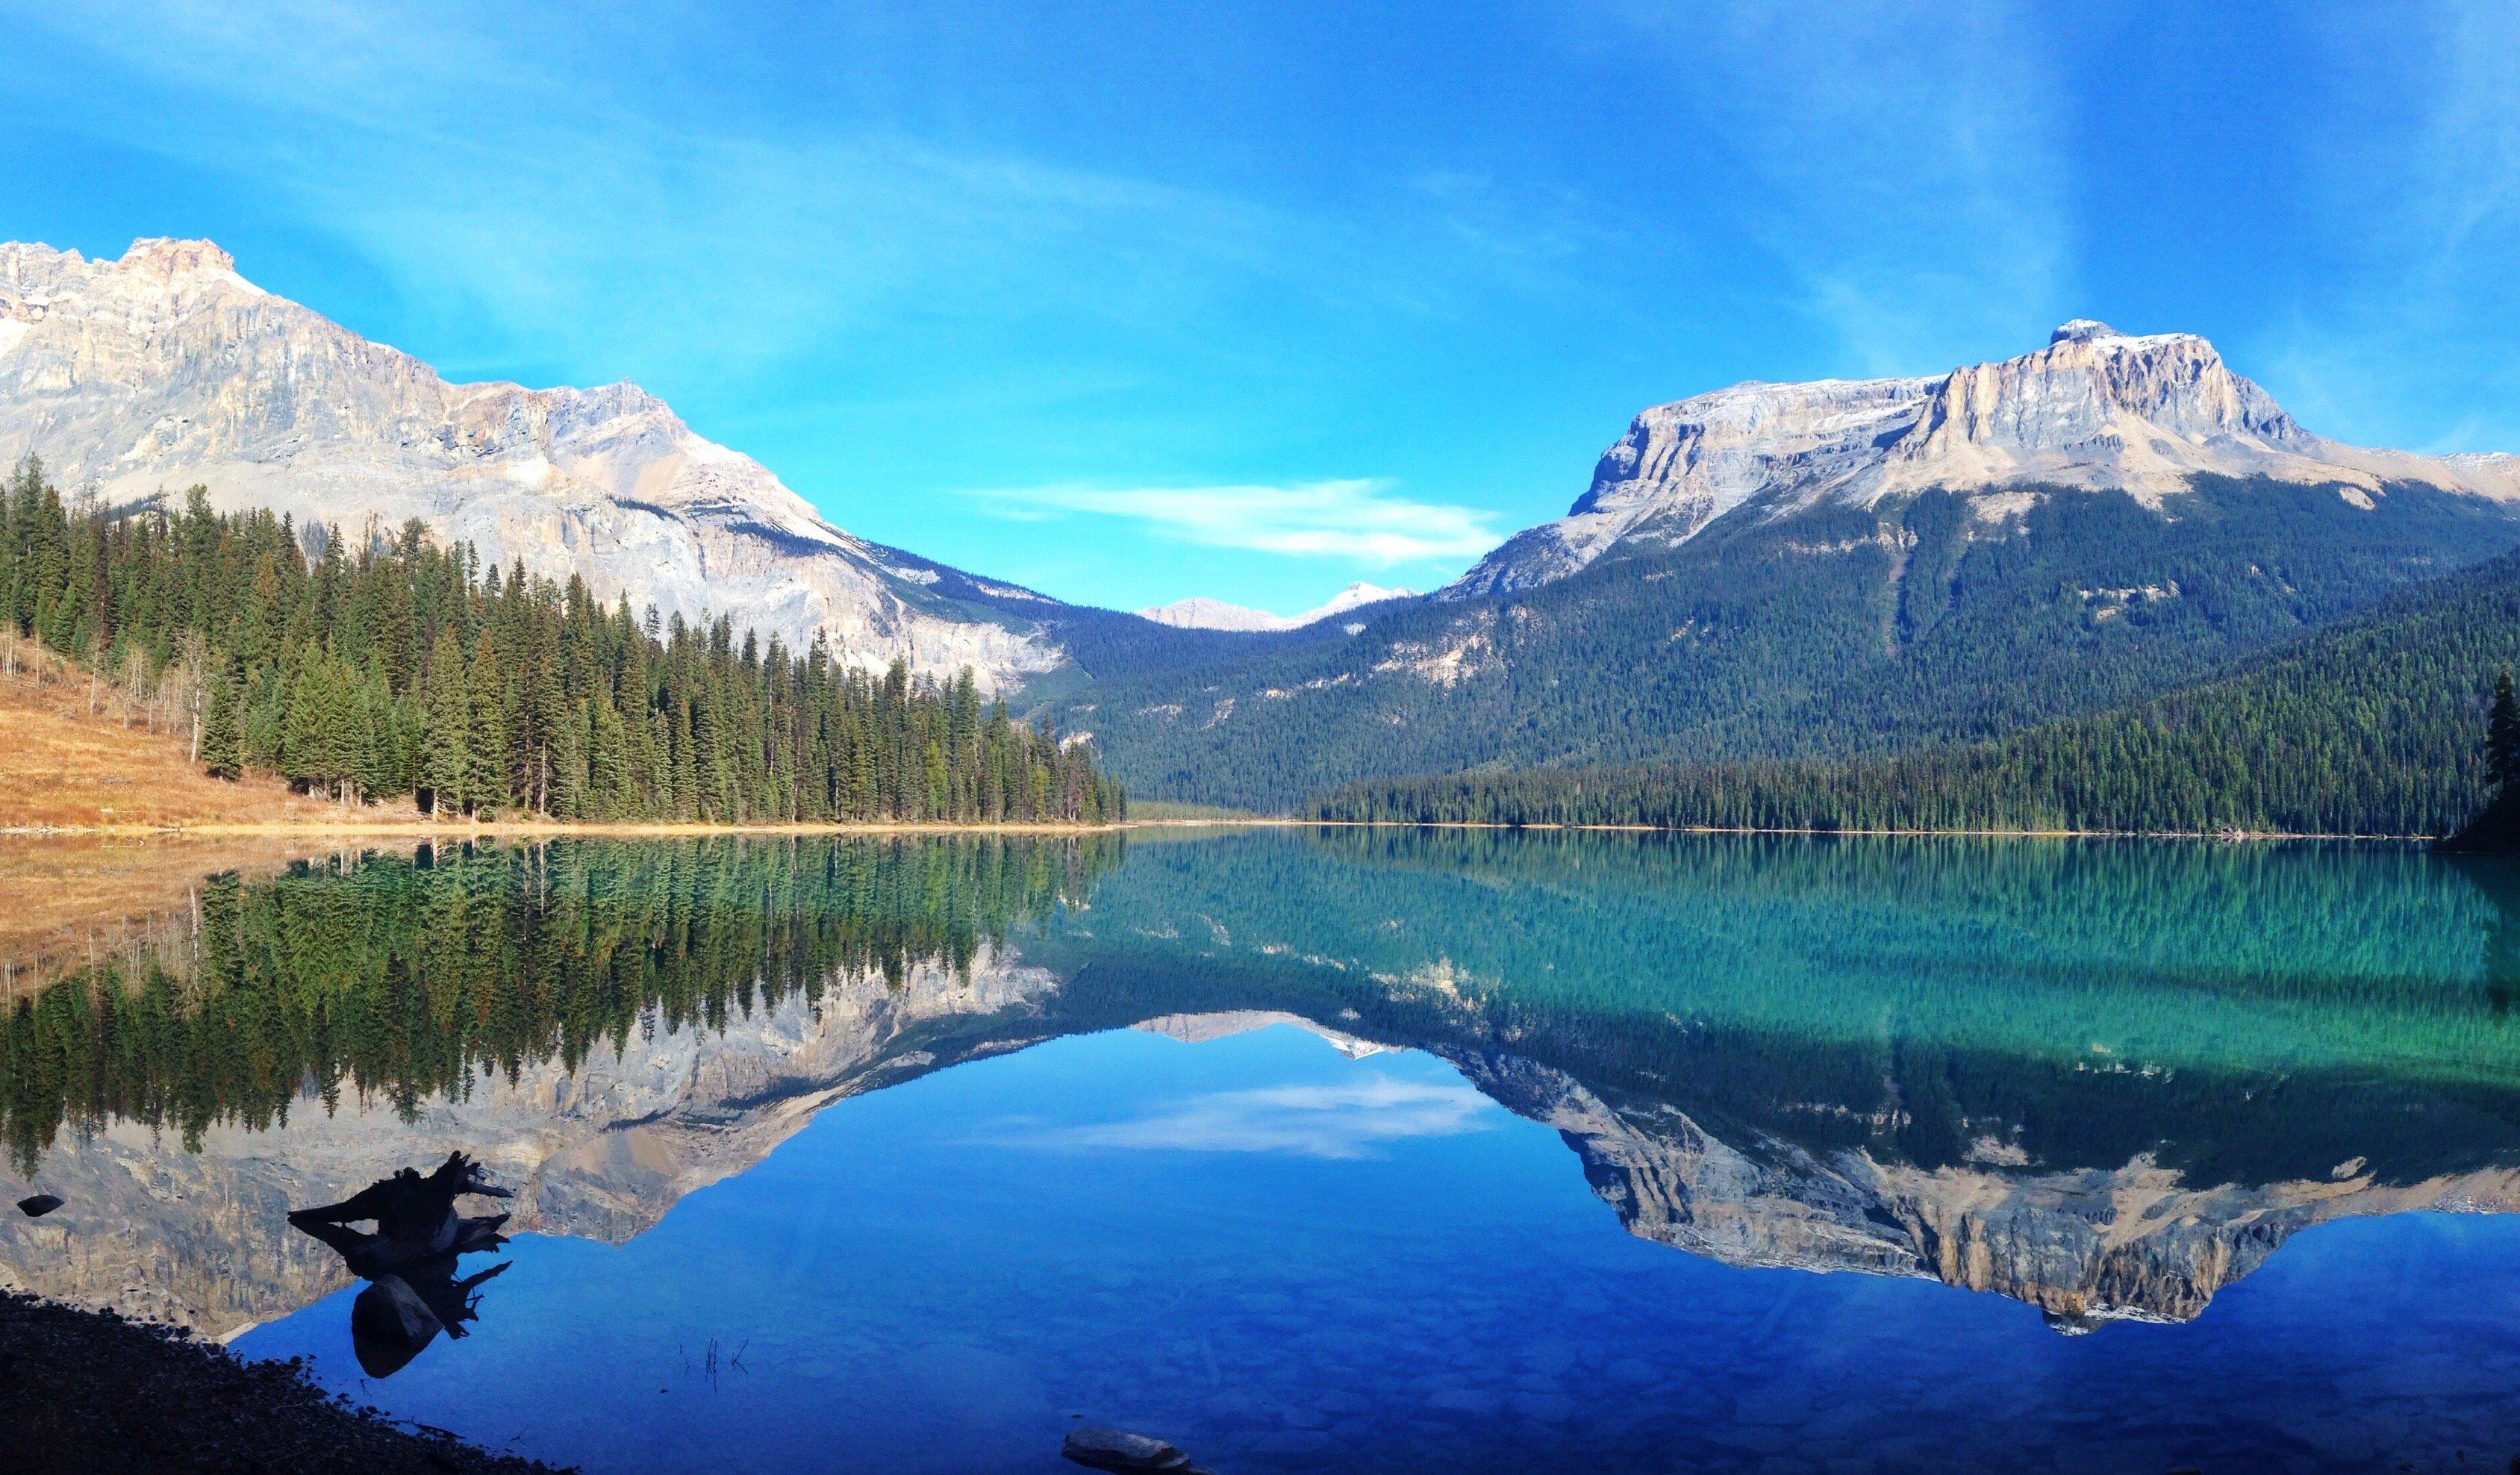 400 800 Hd Wallpaper Beautiful Mountain Reflection At Emerald Lake Yoho